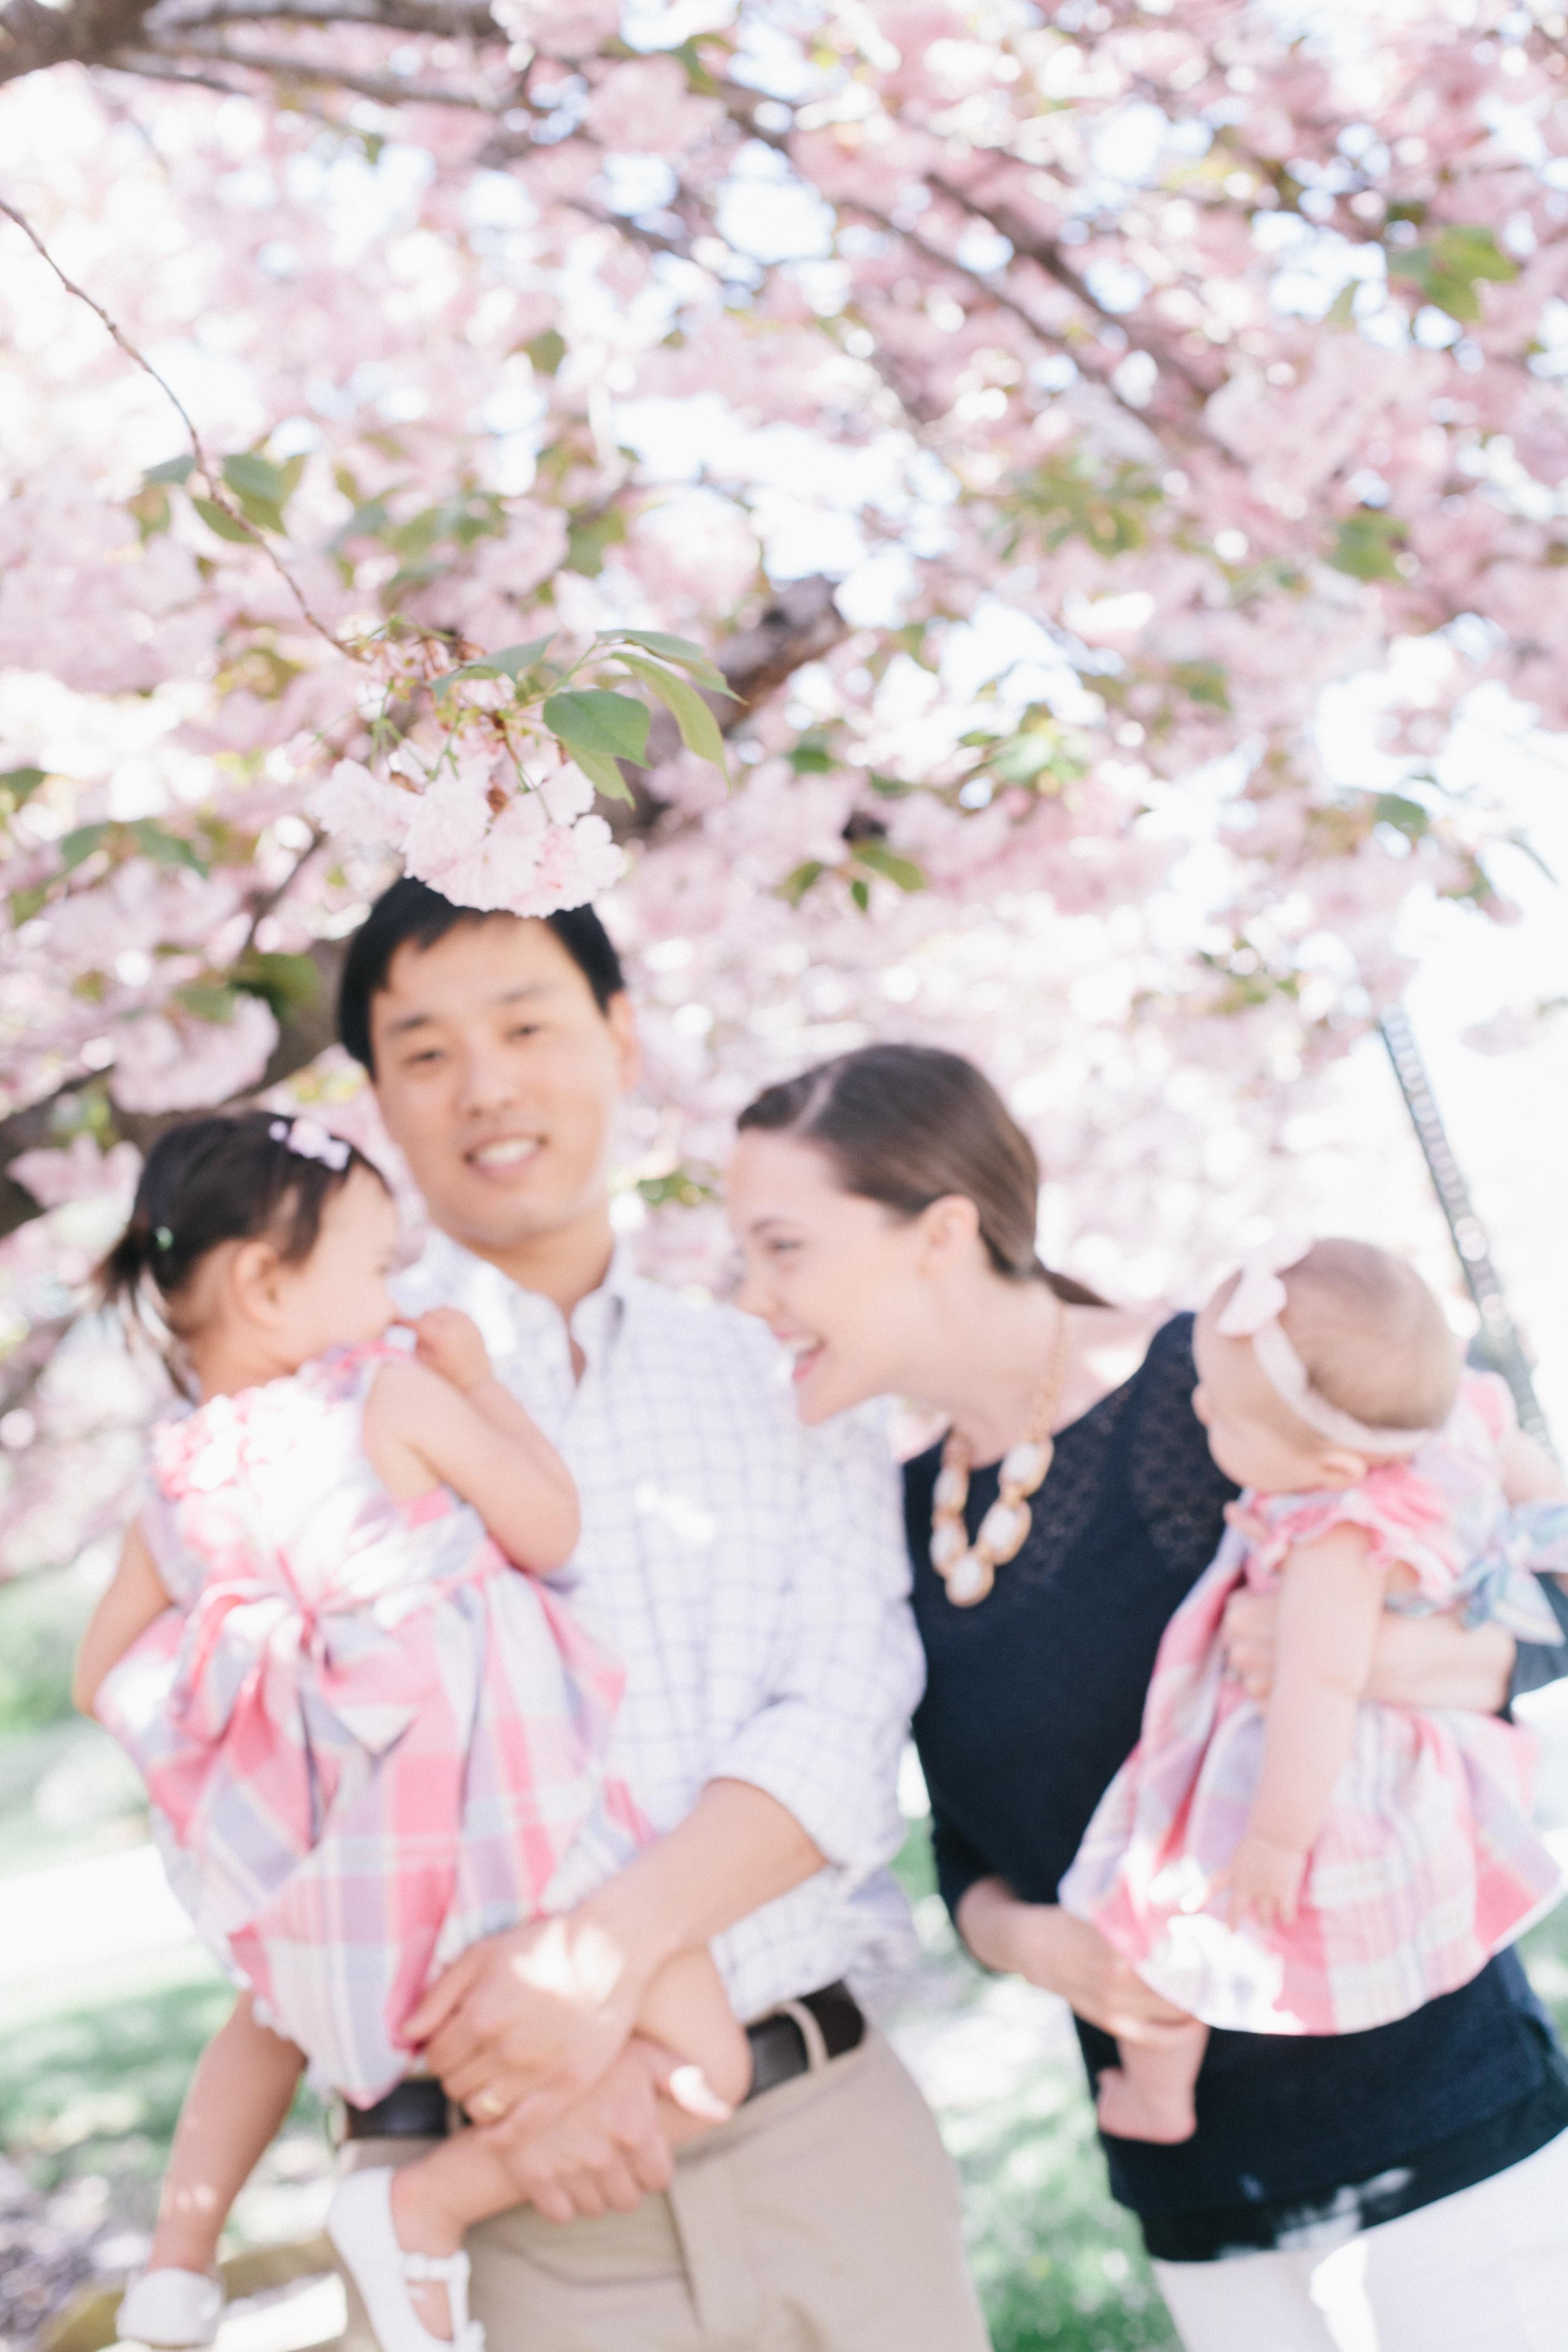 Son_Family_April_007.jpg